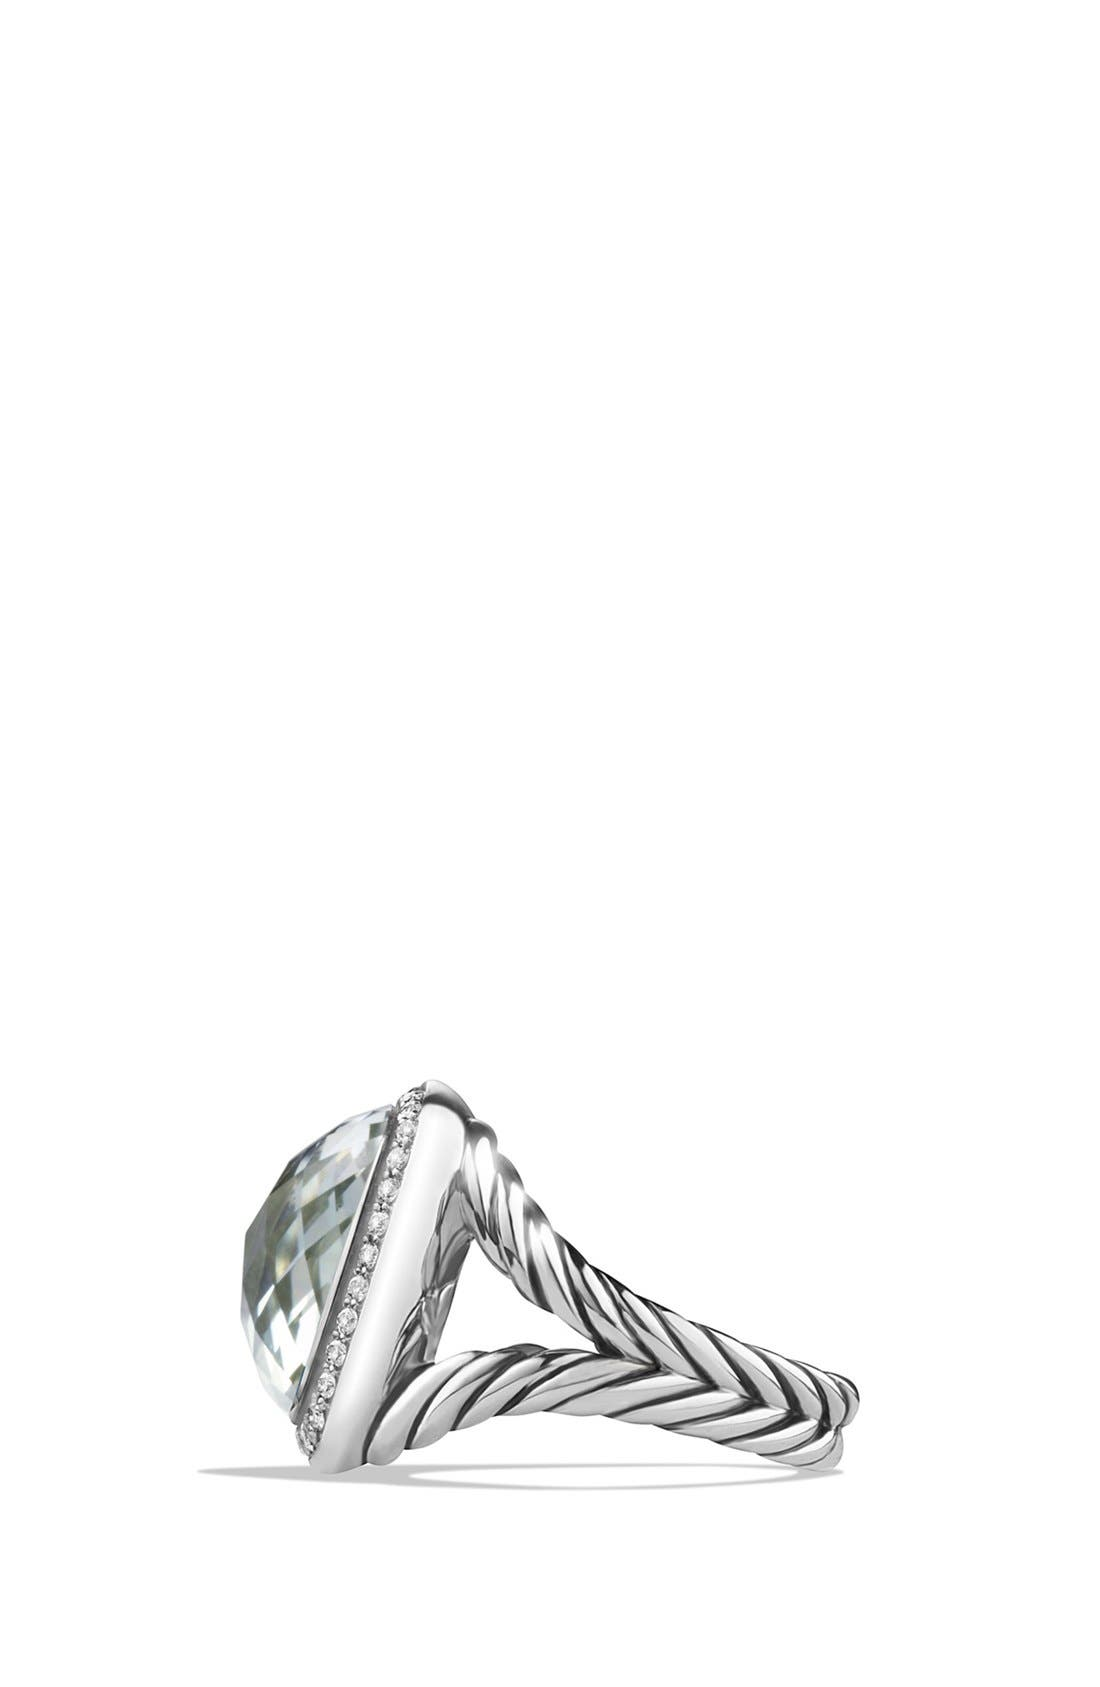 'Albion' Ring with Semiprecious Stone and Diamonds,                             Alternate thumbnail 4, color,                             PRASIOLITE